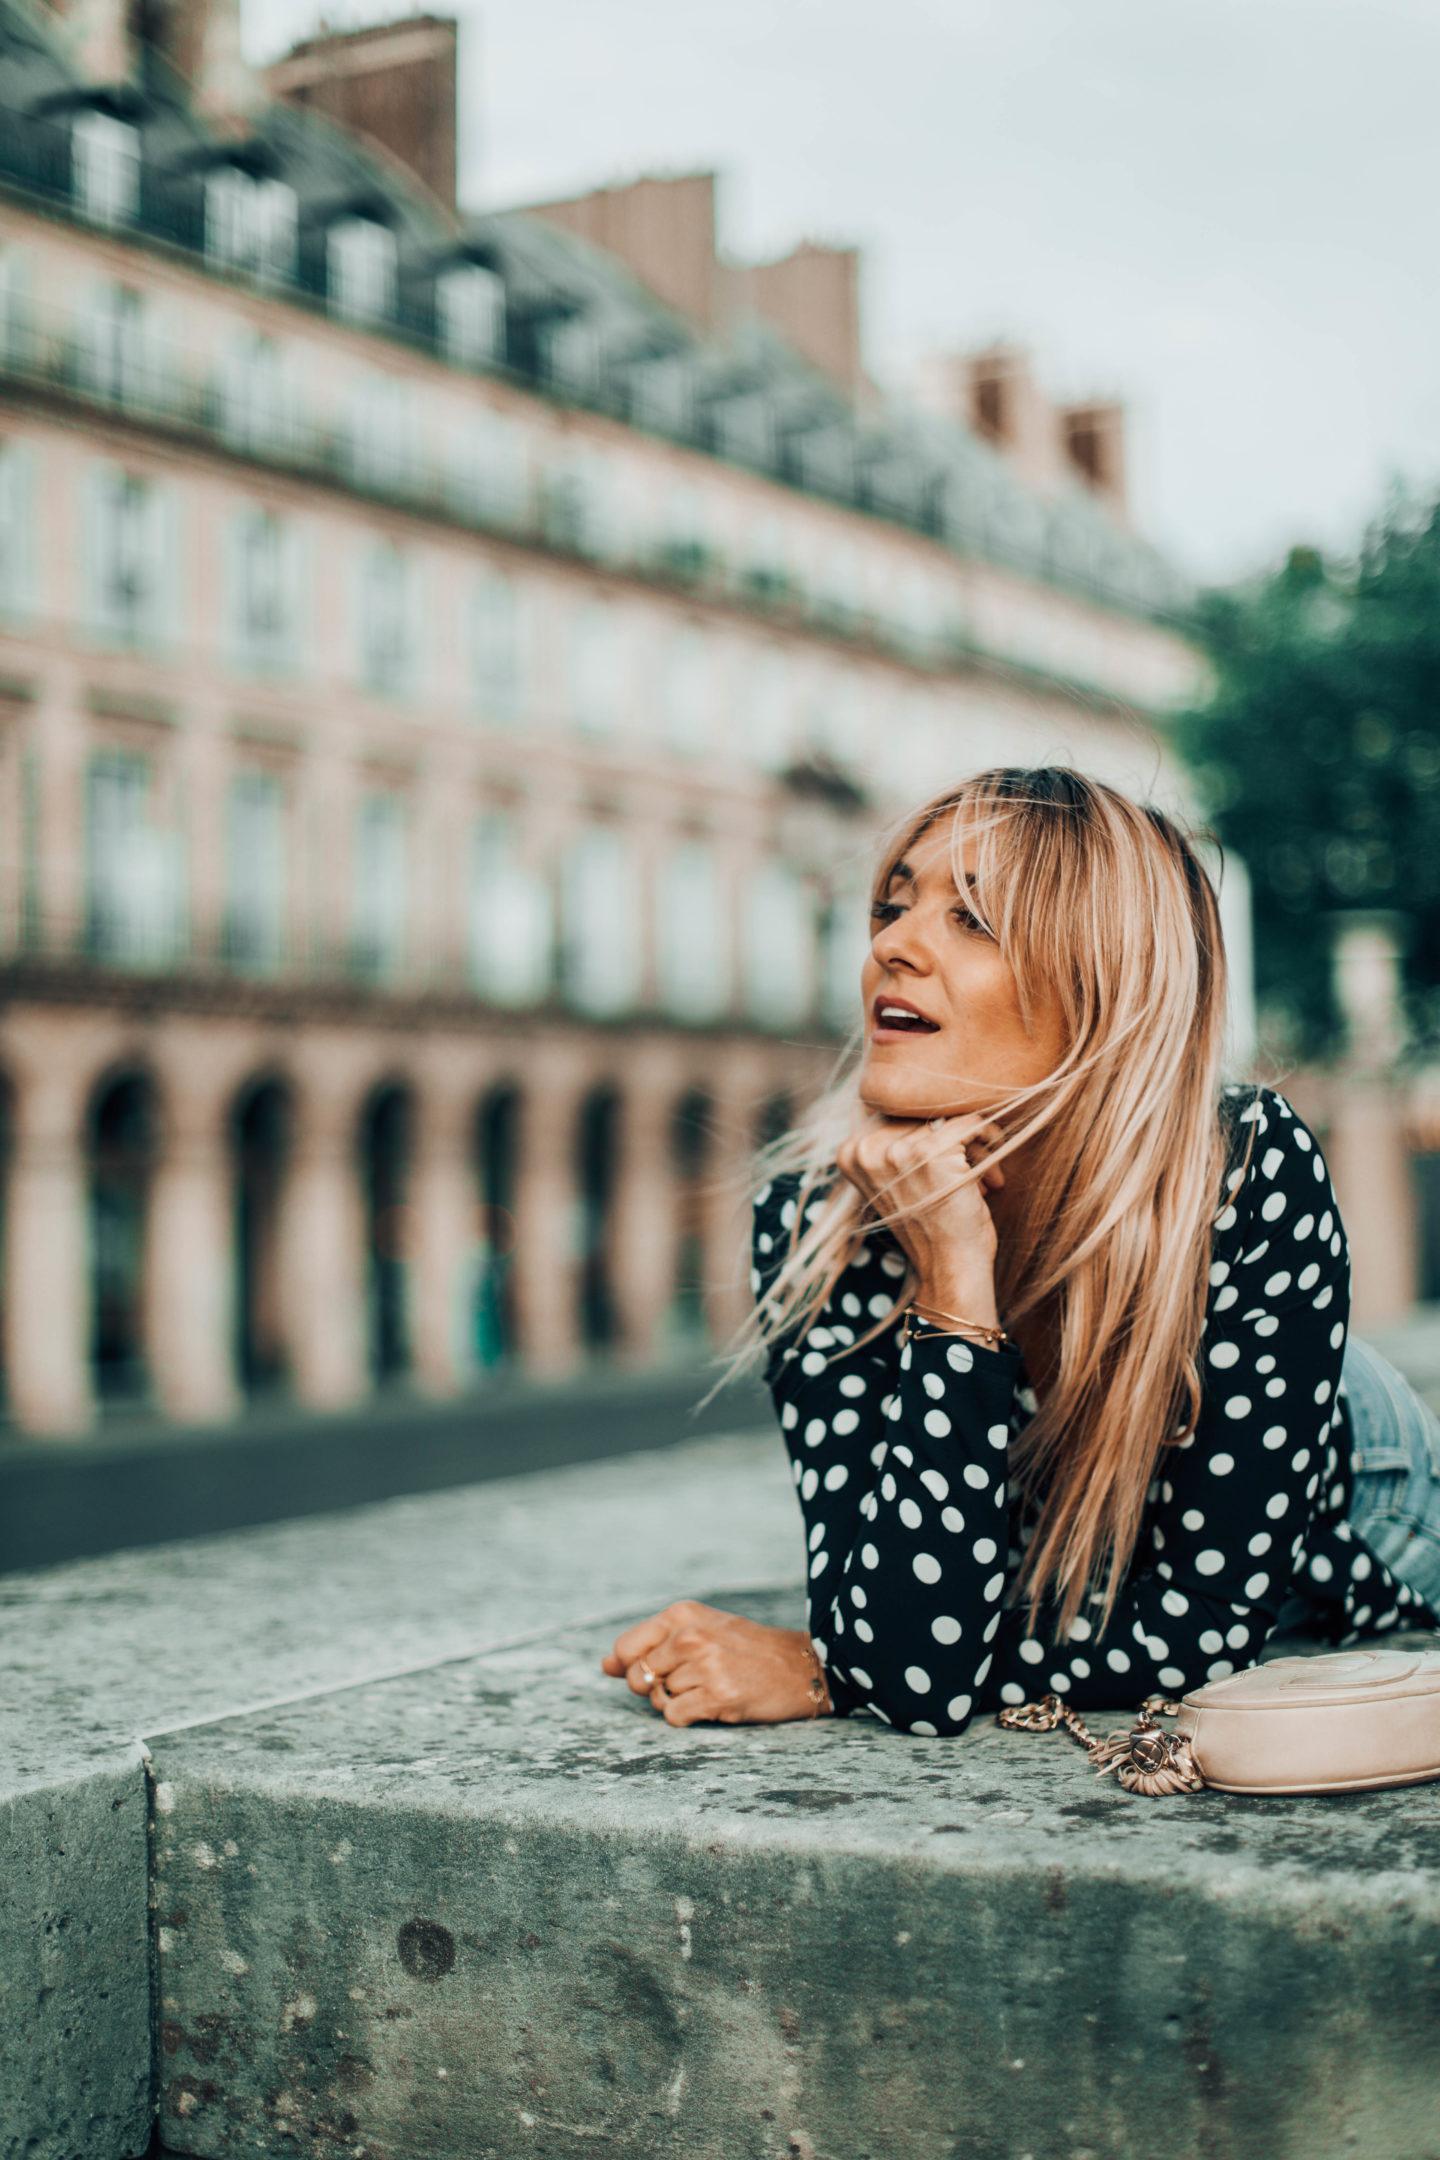 Boohoo - Blondie Baby blog mode Paris et voyages